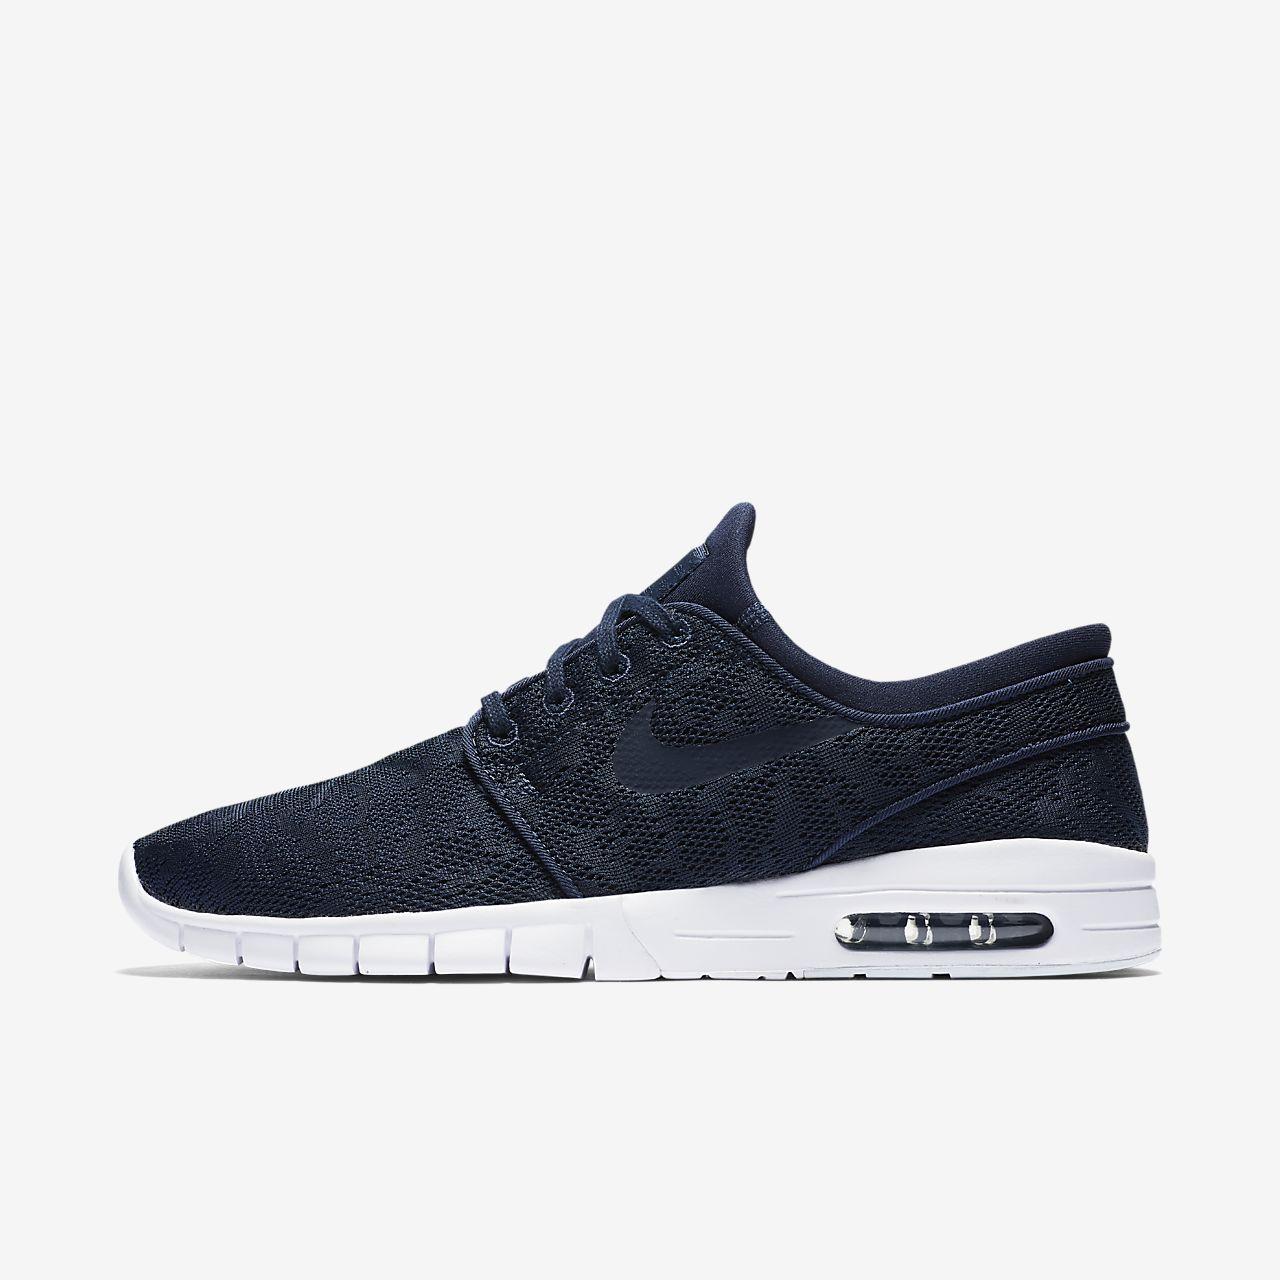 ed021dbcd7c3 stefan janoski sb shoes online   OFF47% Discounts